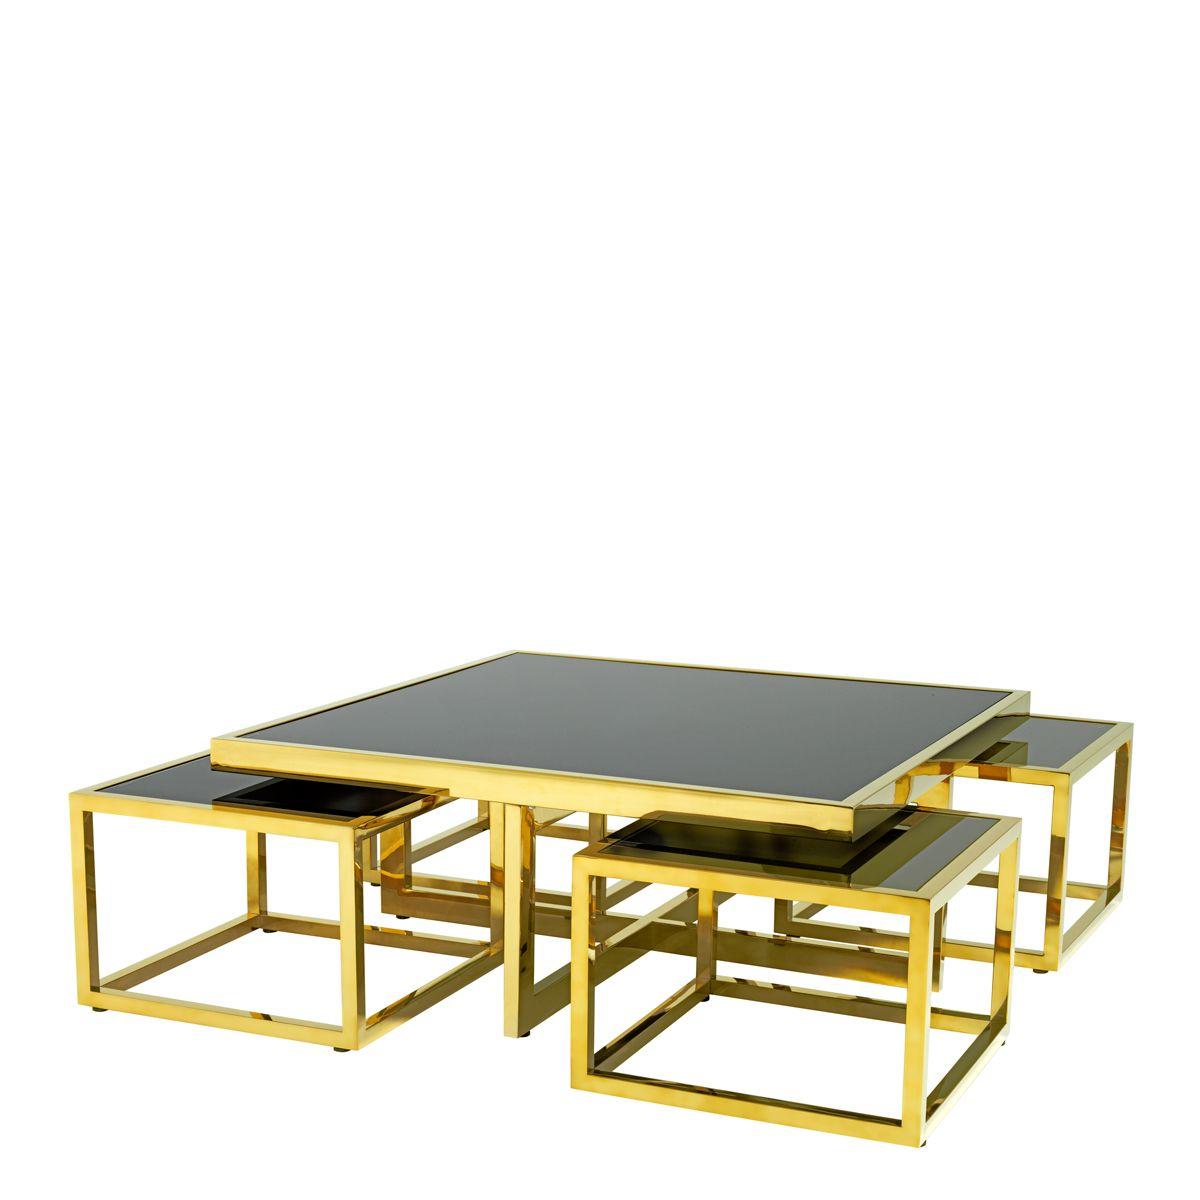 Coffee Table Monogram Coffee Table Large Square Coffee Table Coffee Table Setting [ 1200 x 1200 Pixel ]